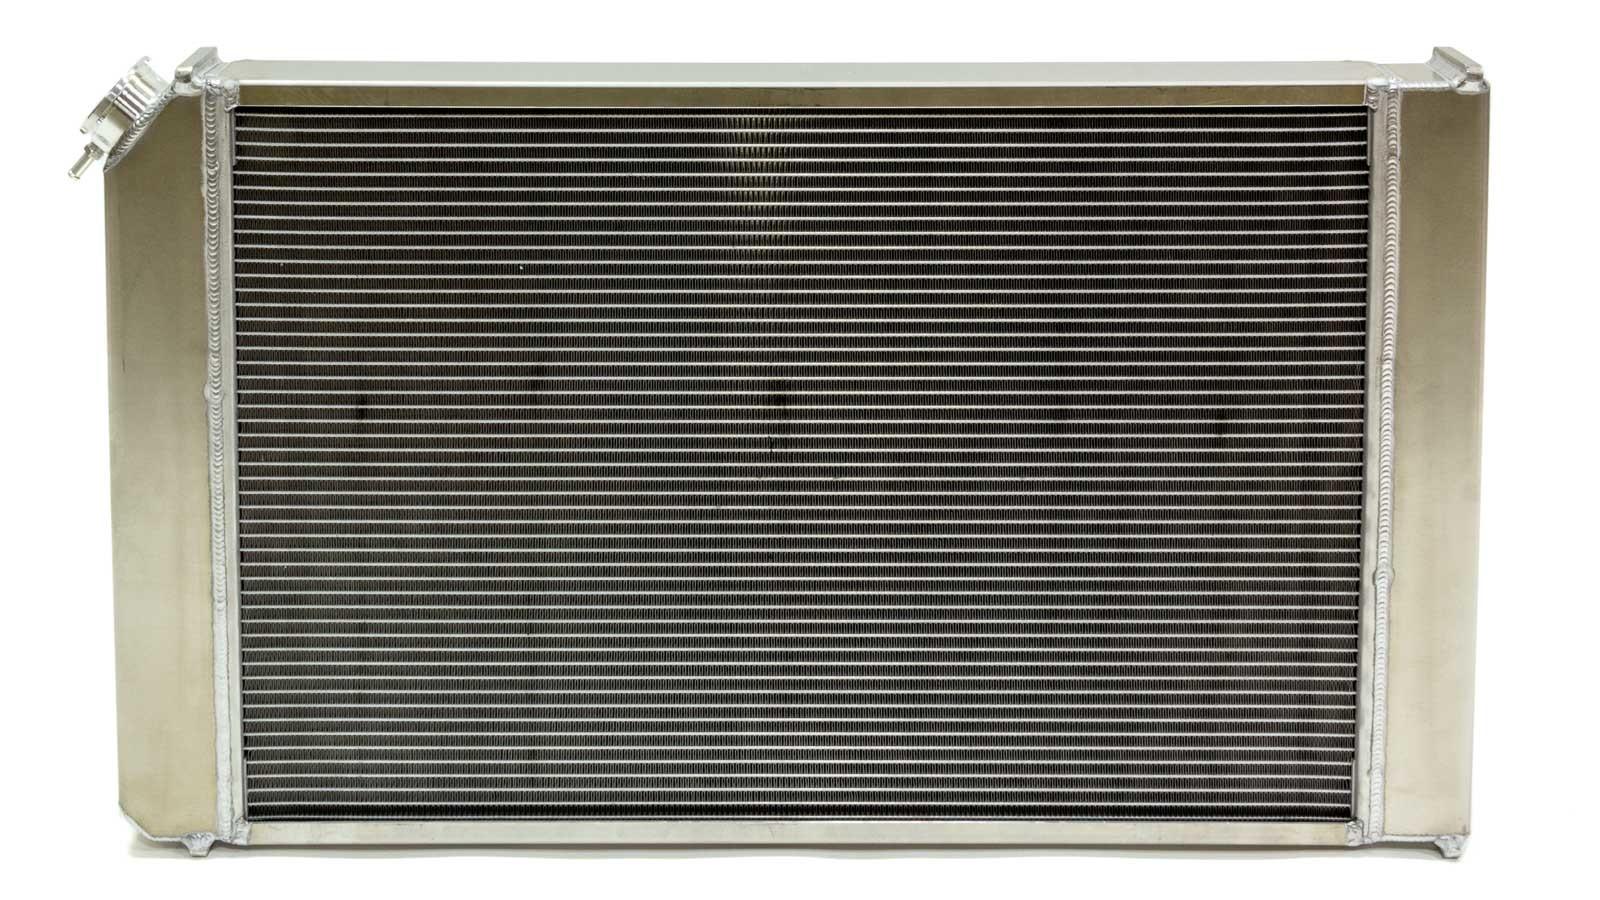 Radiator Chevy C10 67-72 SBC / BBC w/Trans Cooler